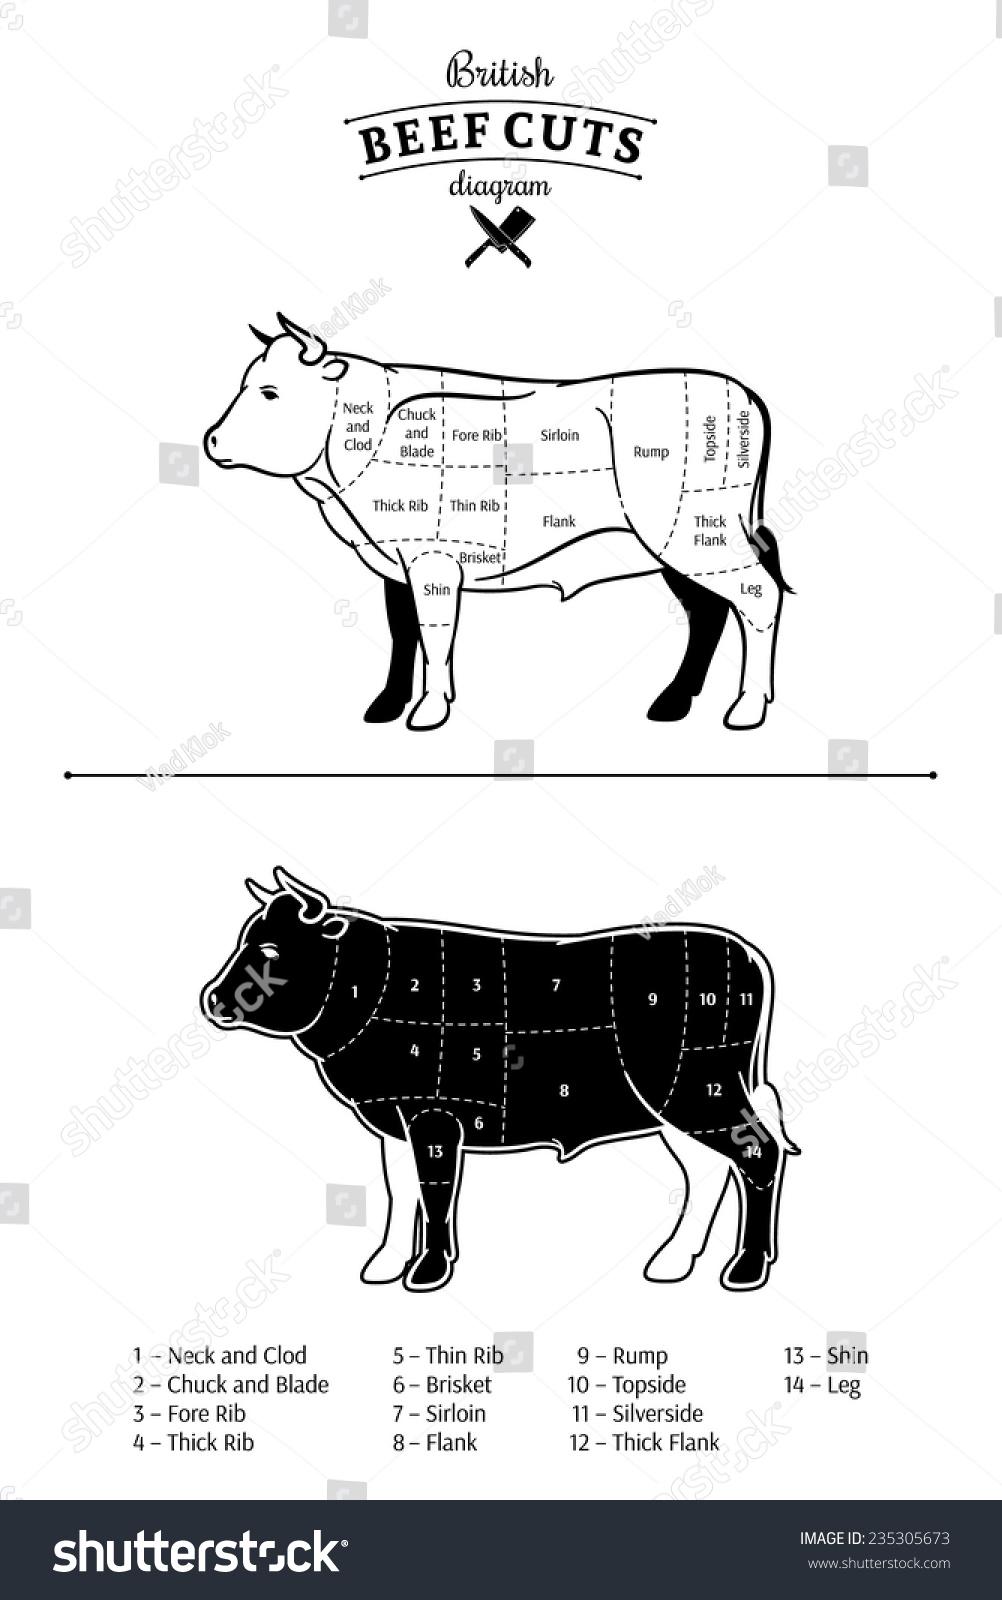 British beef cuts diagram stock vector 235305673 shutterstock british beef cuts diagram pooptronica